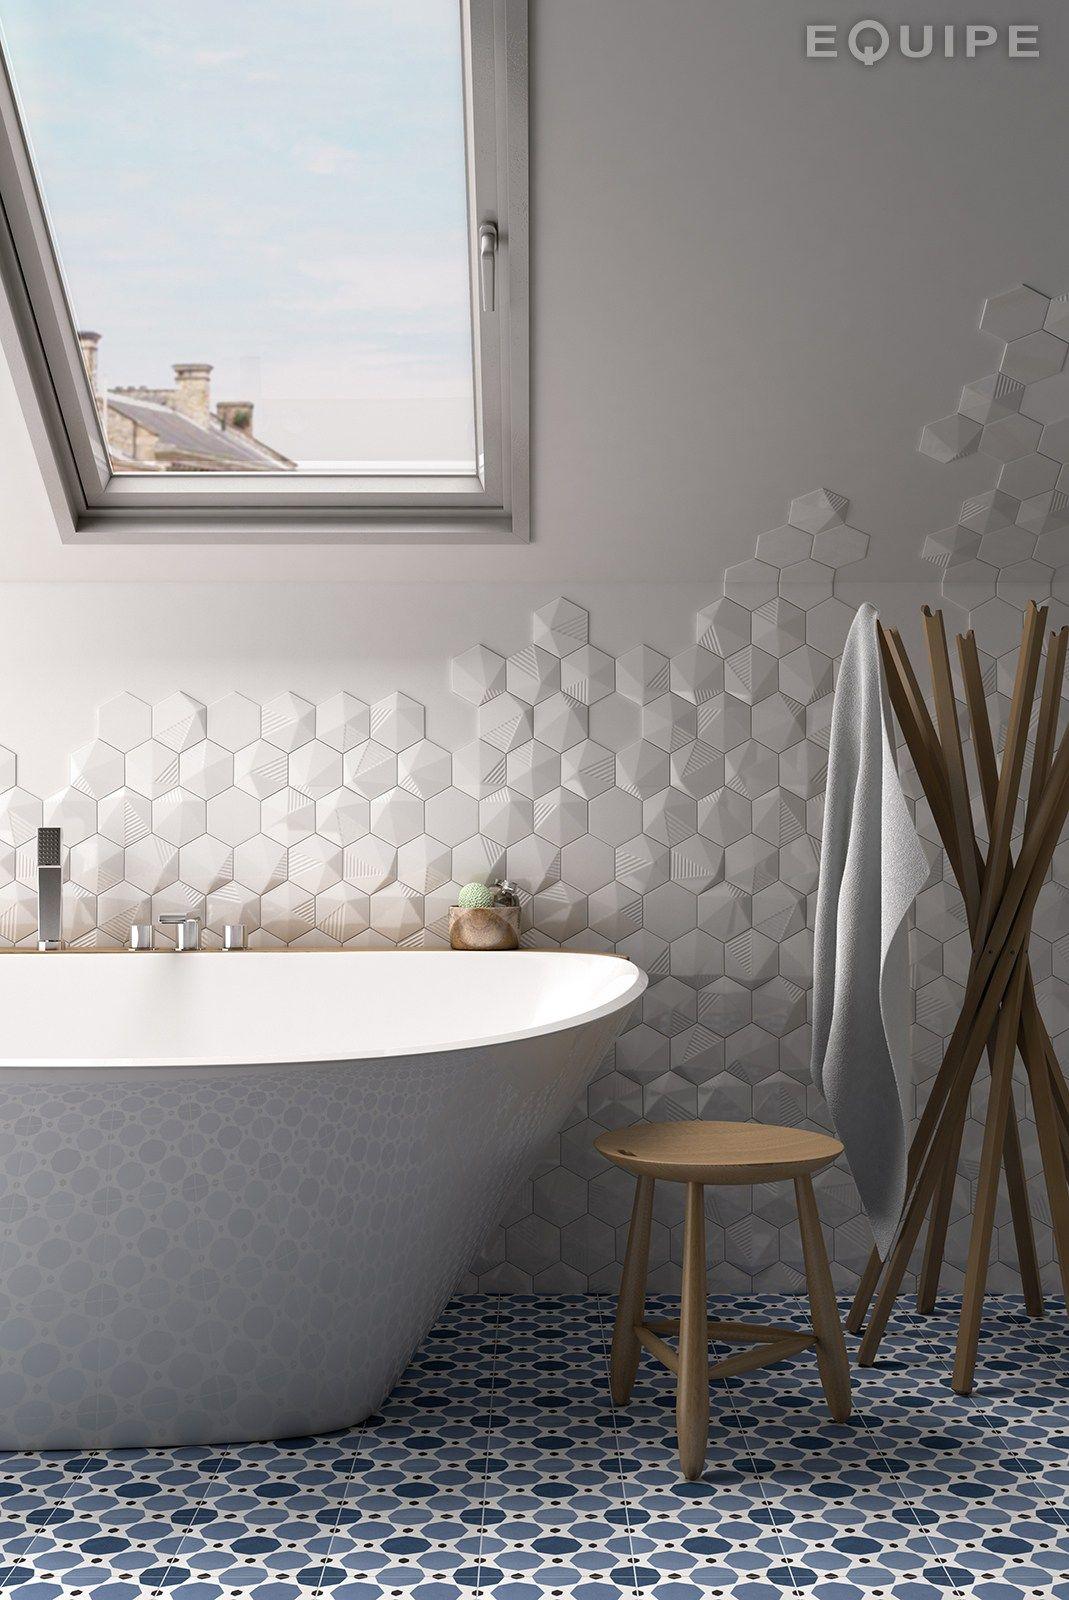 rev tement mural 3d en c ramique p te blanche magical 3 by equipe ceramicas mat riaux. Black Bedroom Furniture Sets. Home Design Ideas